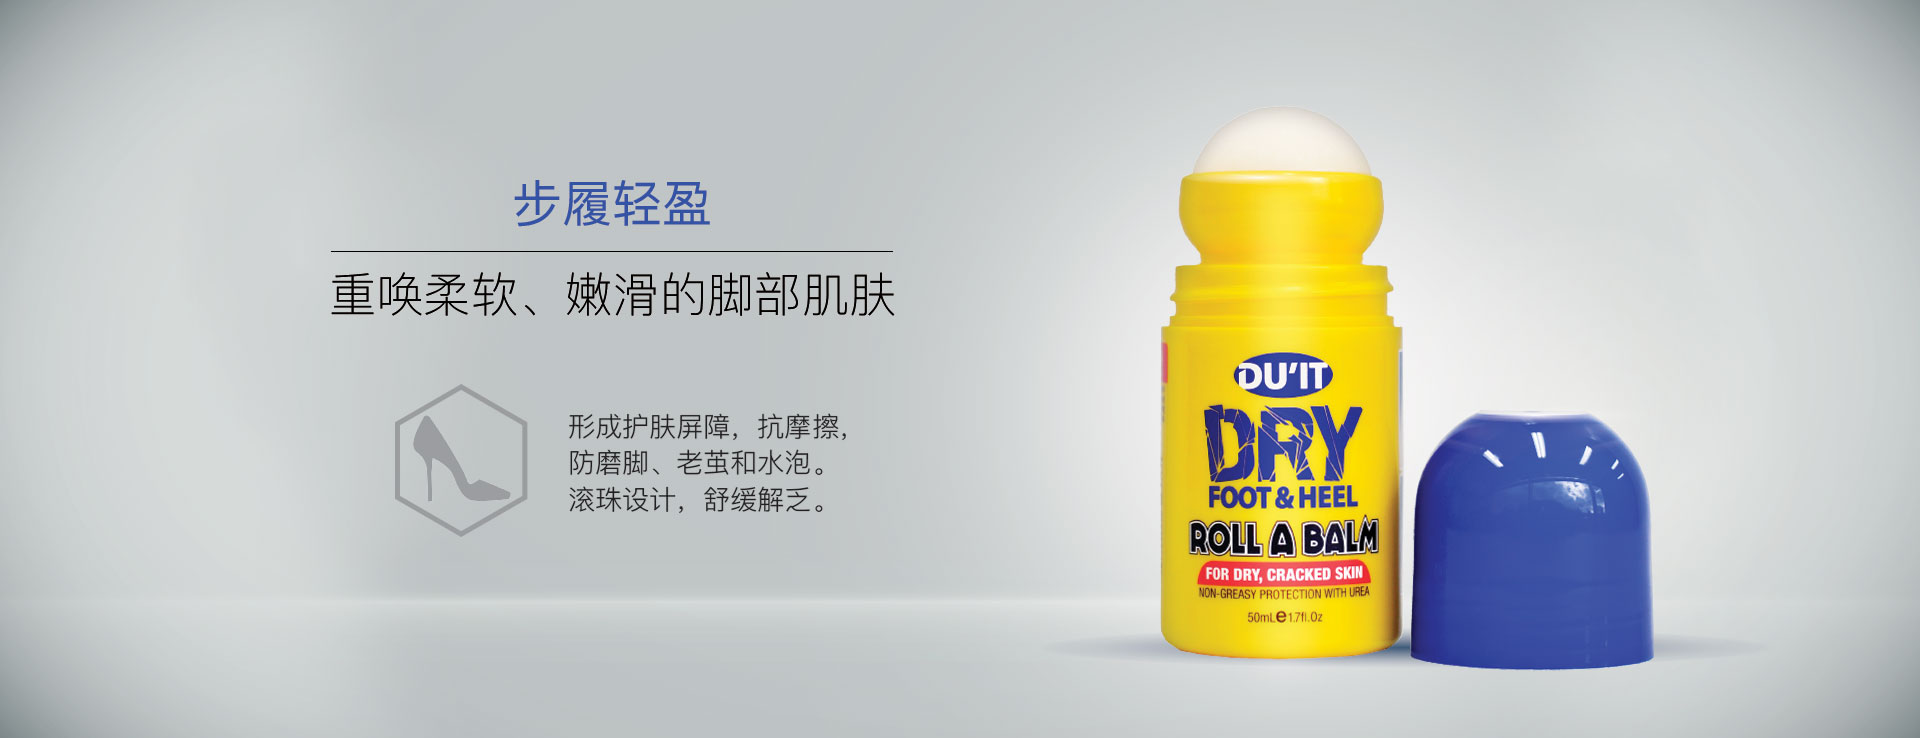 DUIT经典润燥系列,DUIT产品大全